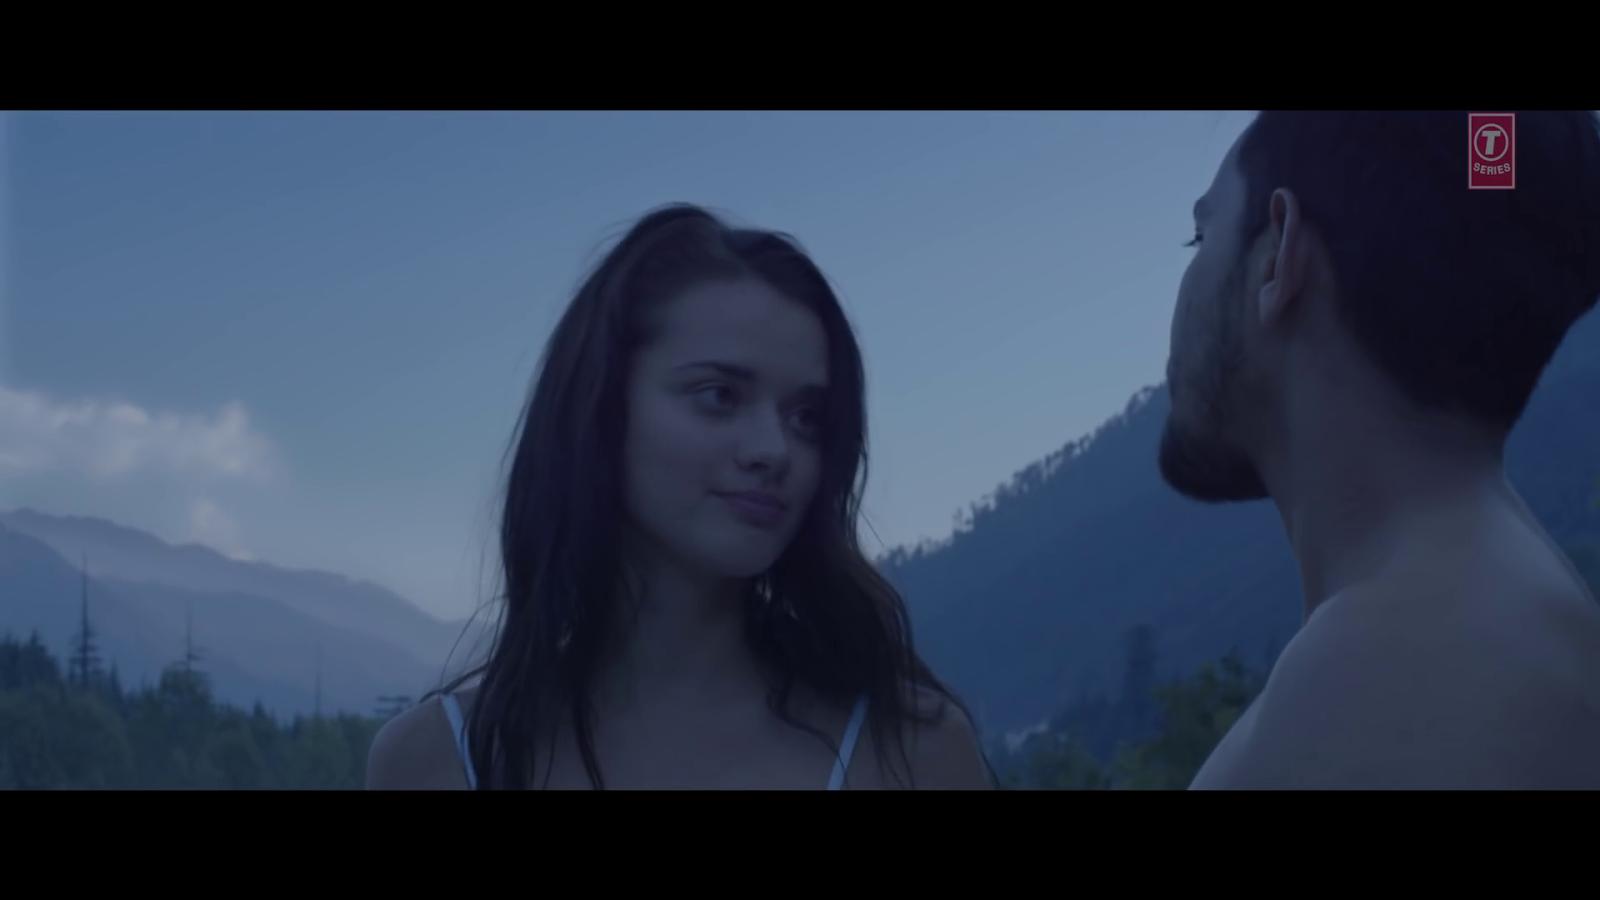 Zindagi - Full HD Video Song - Aditya Narayan - Hindi Video